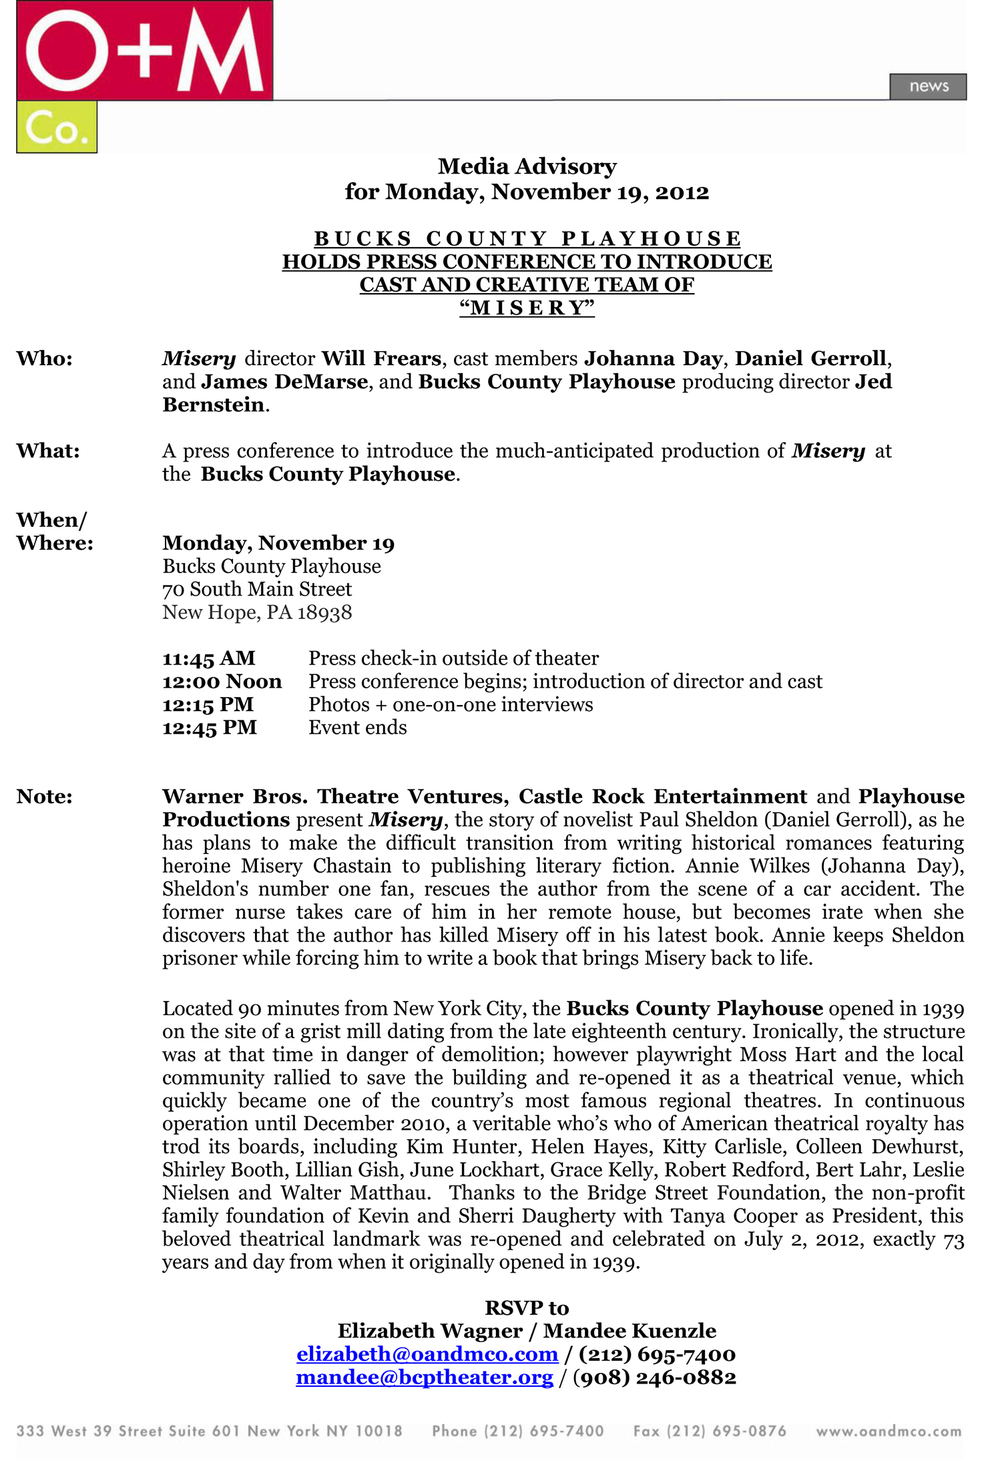 BCP Misery Press Conference Media Alert 11-19-12 FINAL.jpg